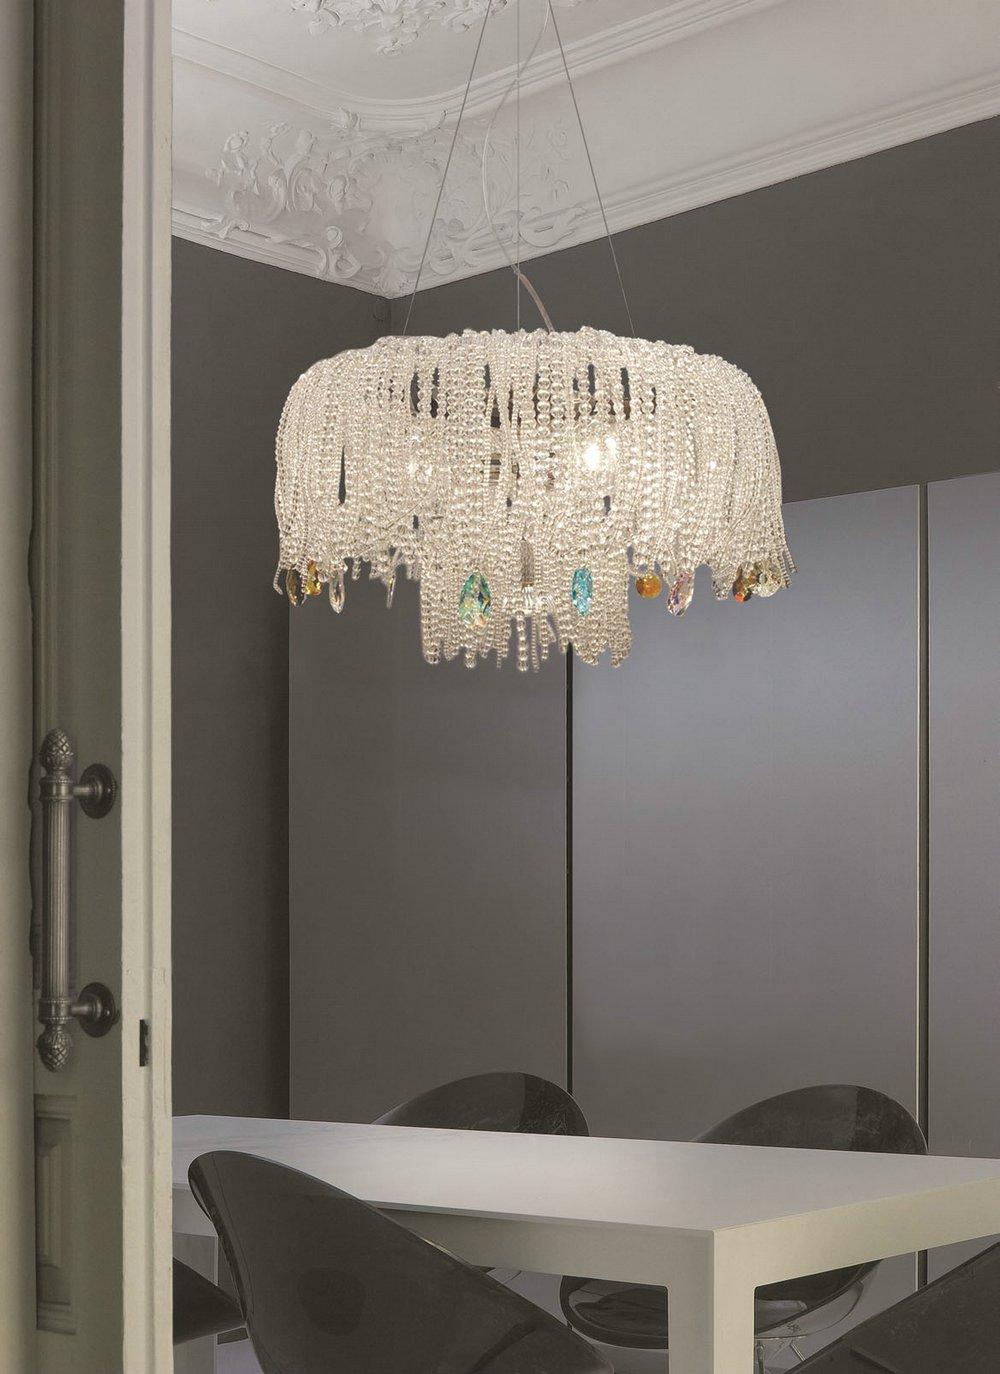 Mossi 1C60 Pendant Lamp Single 60cm Chrome Swarovski Glass